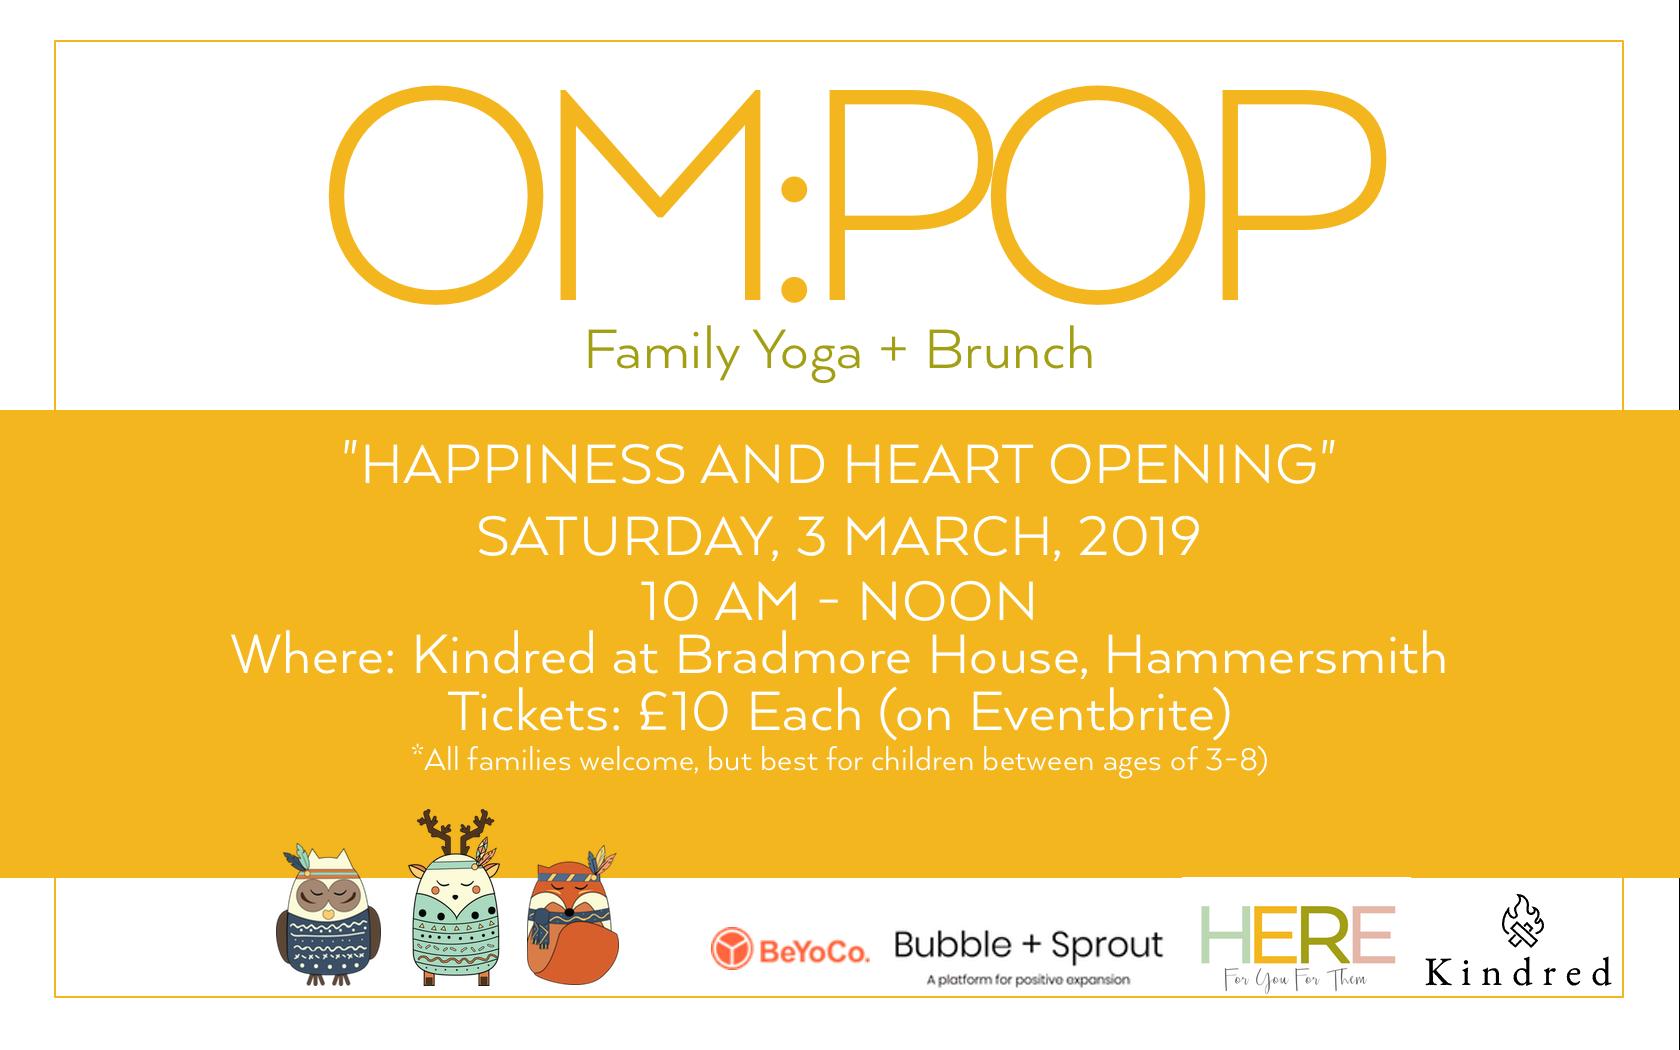 Om:Pop Family Yoga and Brunch, Hammersmith London at Kindred, Dana Dyksterhuis, Jen Armstrong, Karin Schrijvers, Hammersmith Yoga